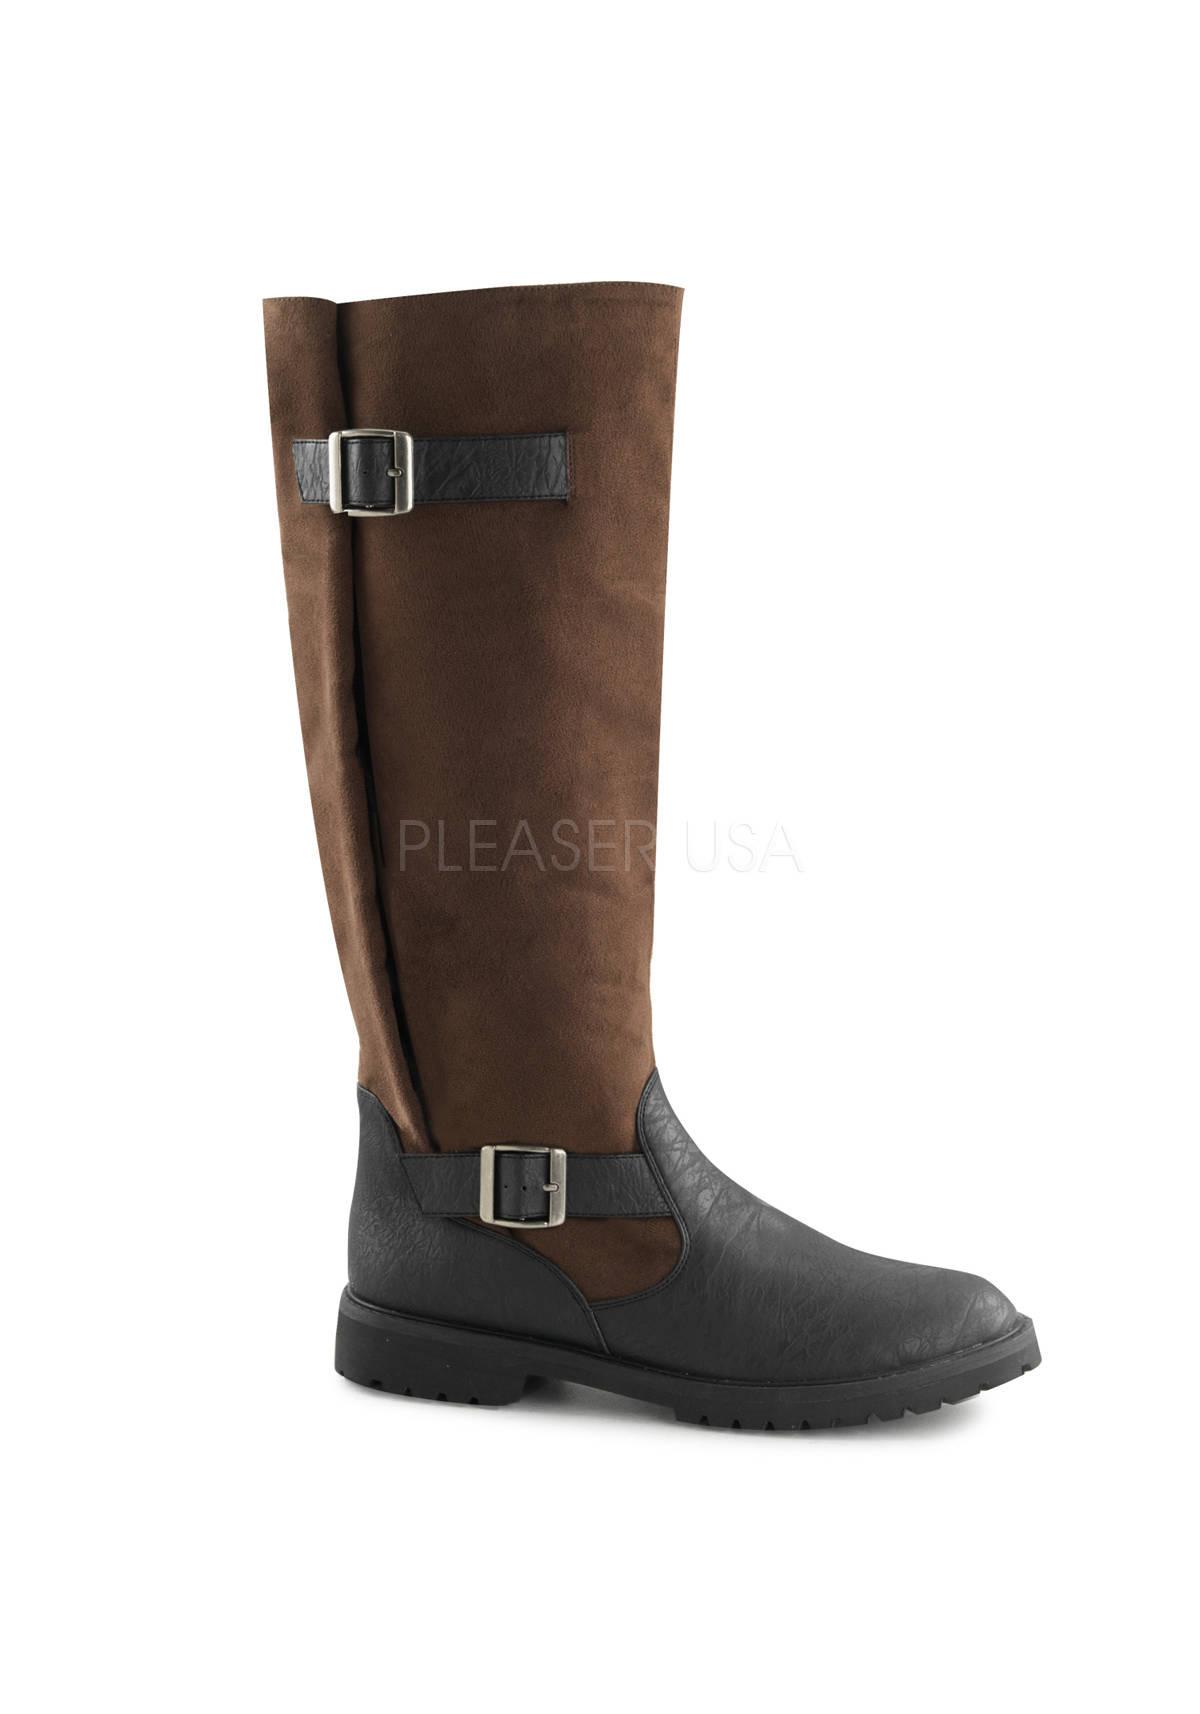 funtasma 1 1 2 inch heel s pull on knee high boot with